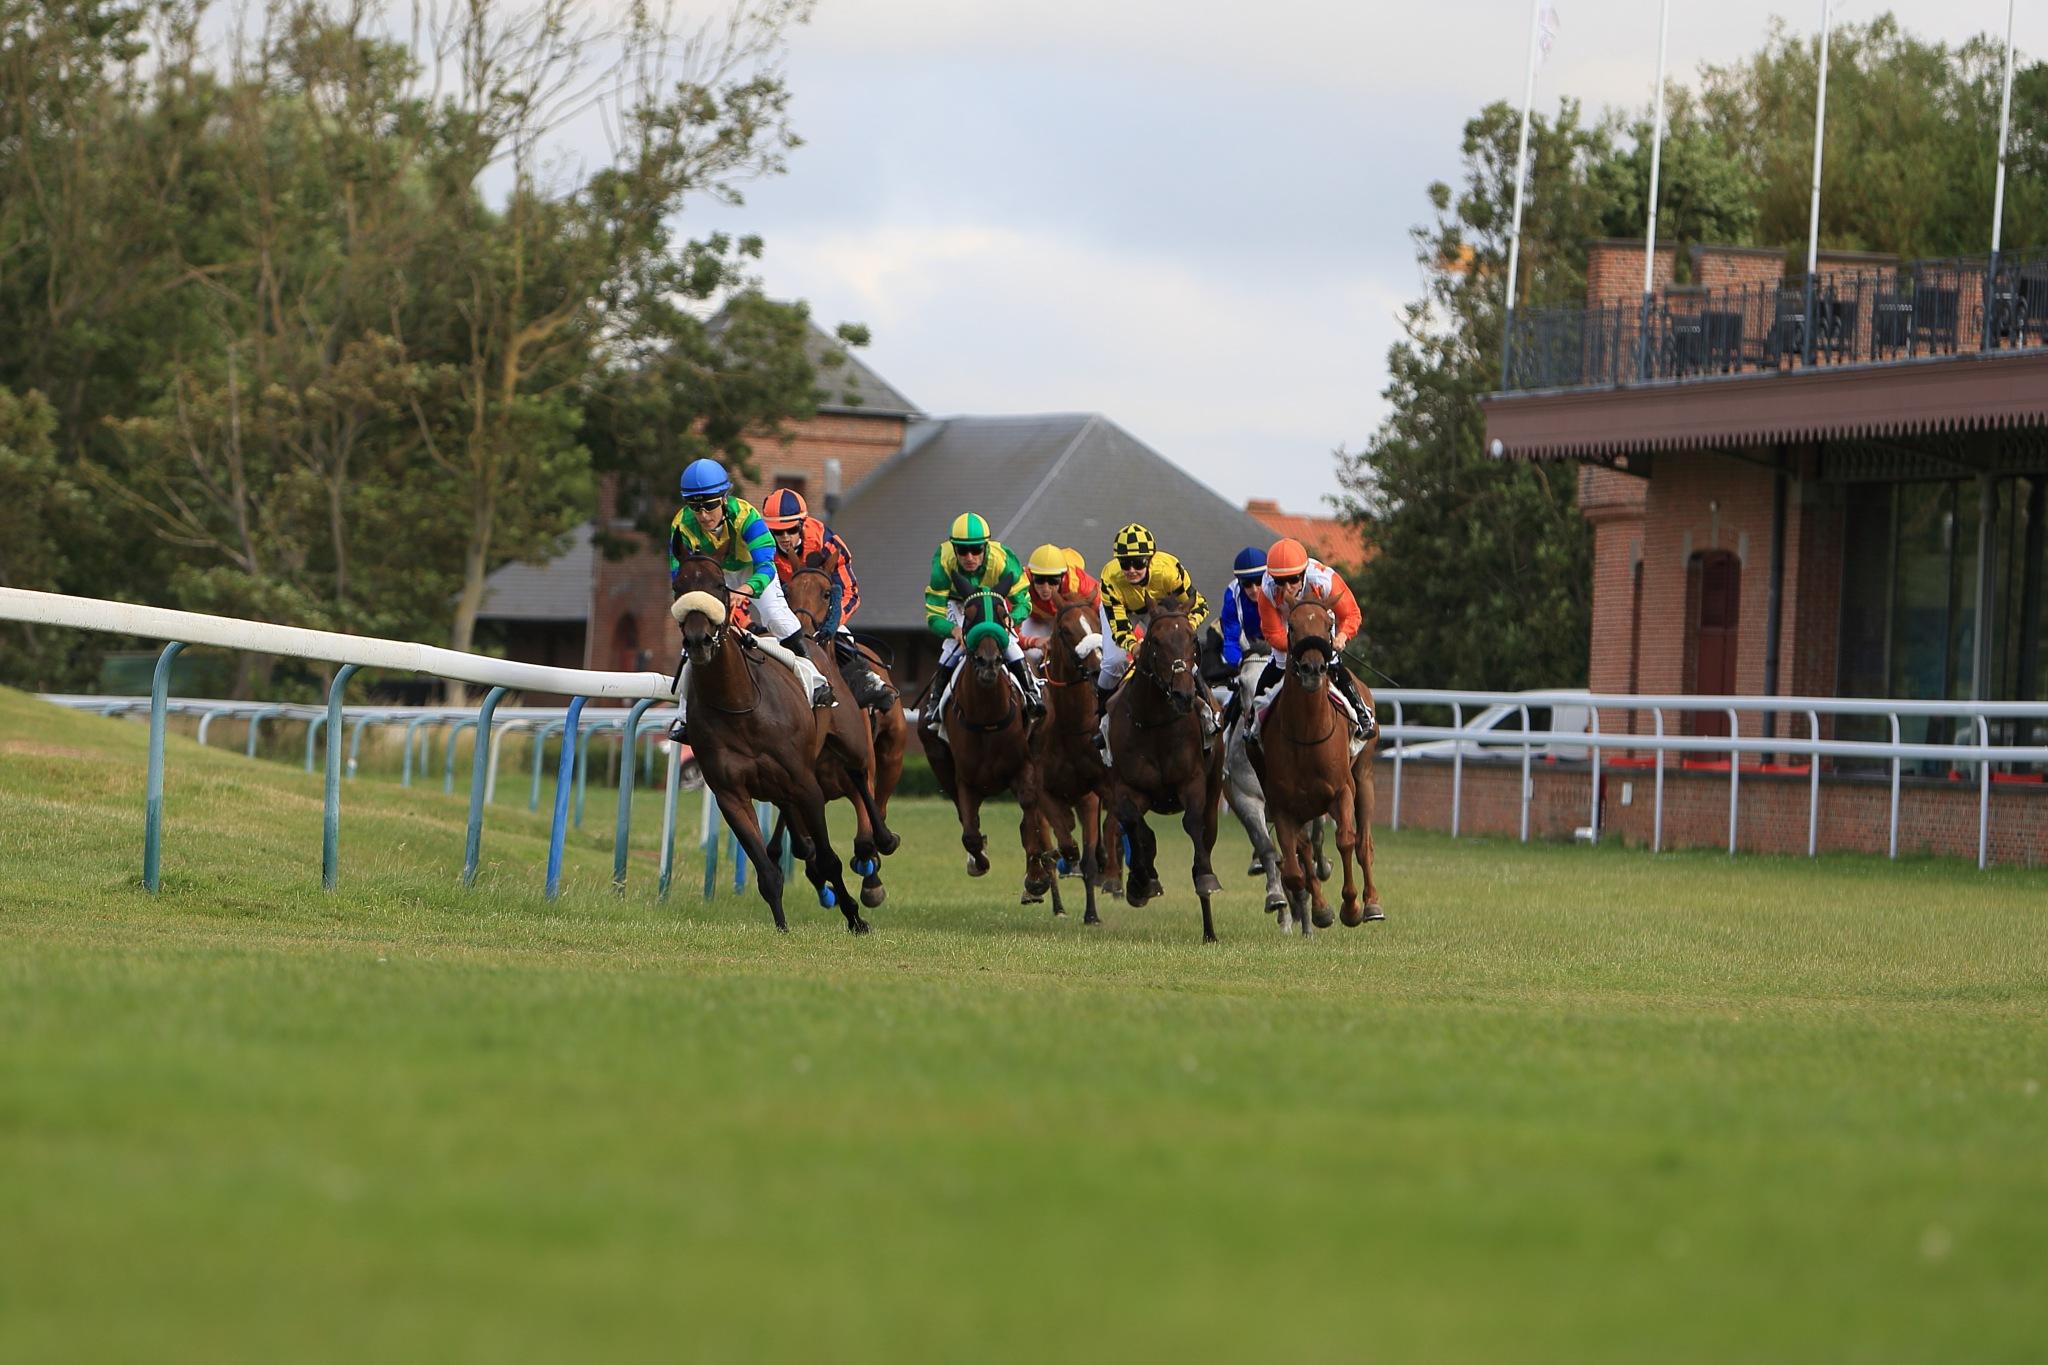 horse race by Danny Passchyn